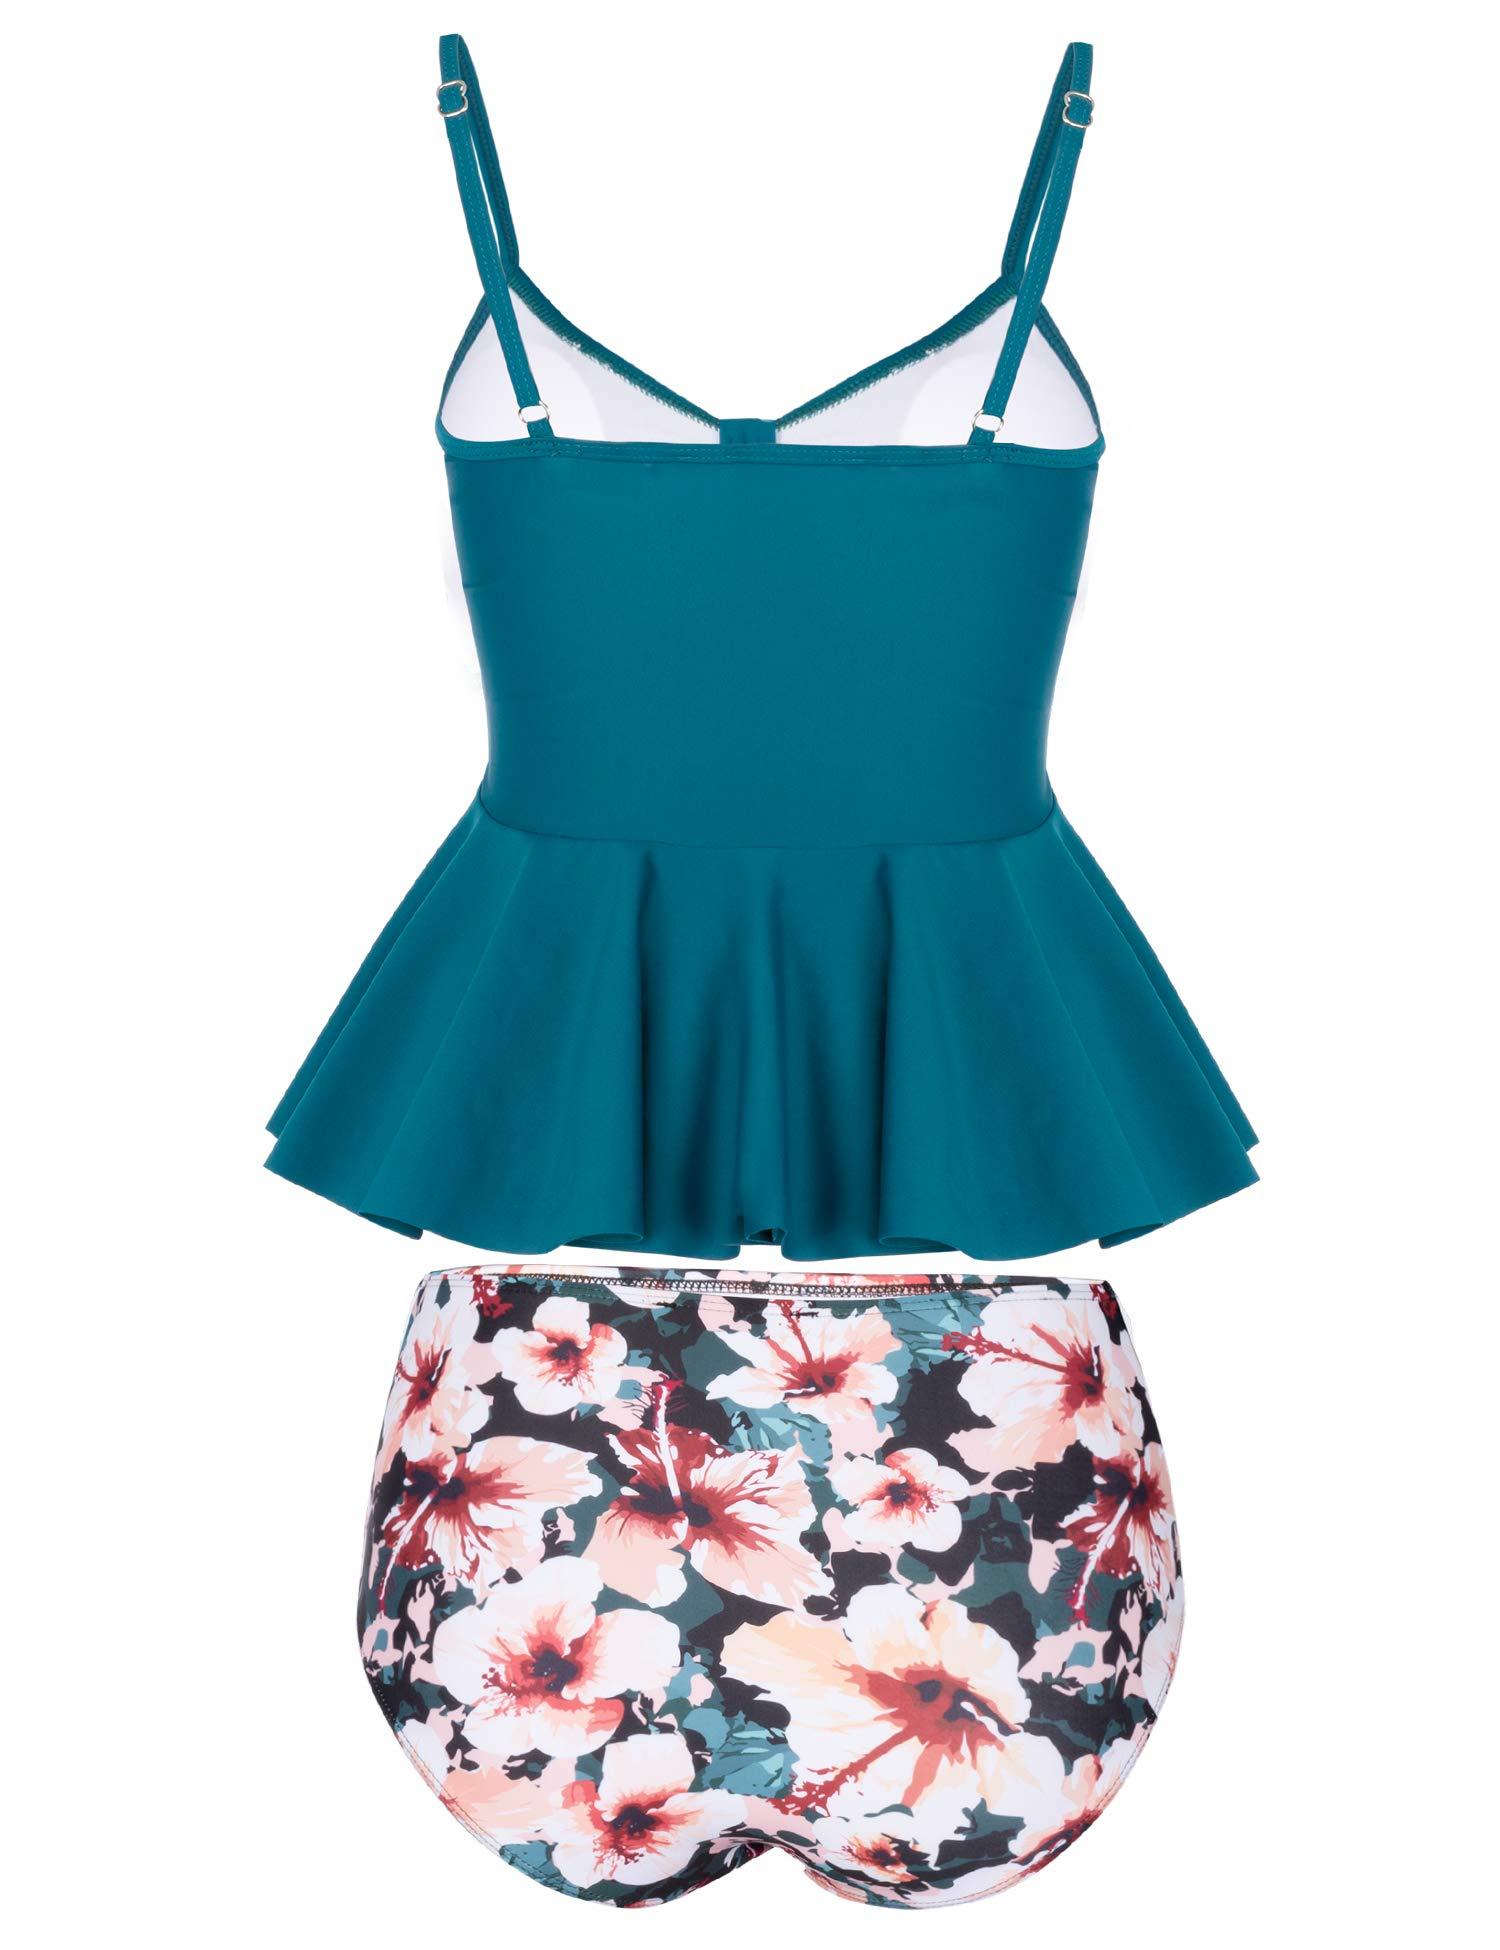 MARINAVIDA Wowen Swimsuit Two Piece Ruffle Tankini Top with High Waisted Bottom Dark Green